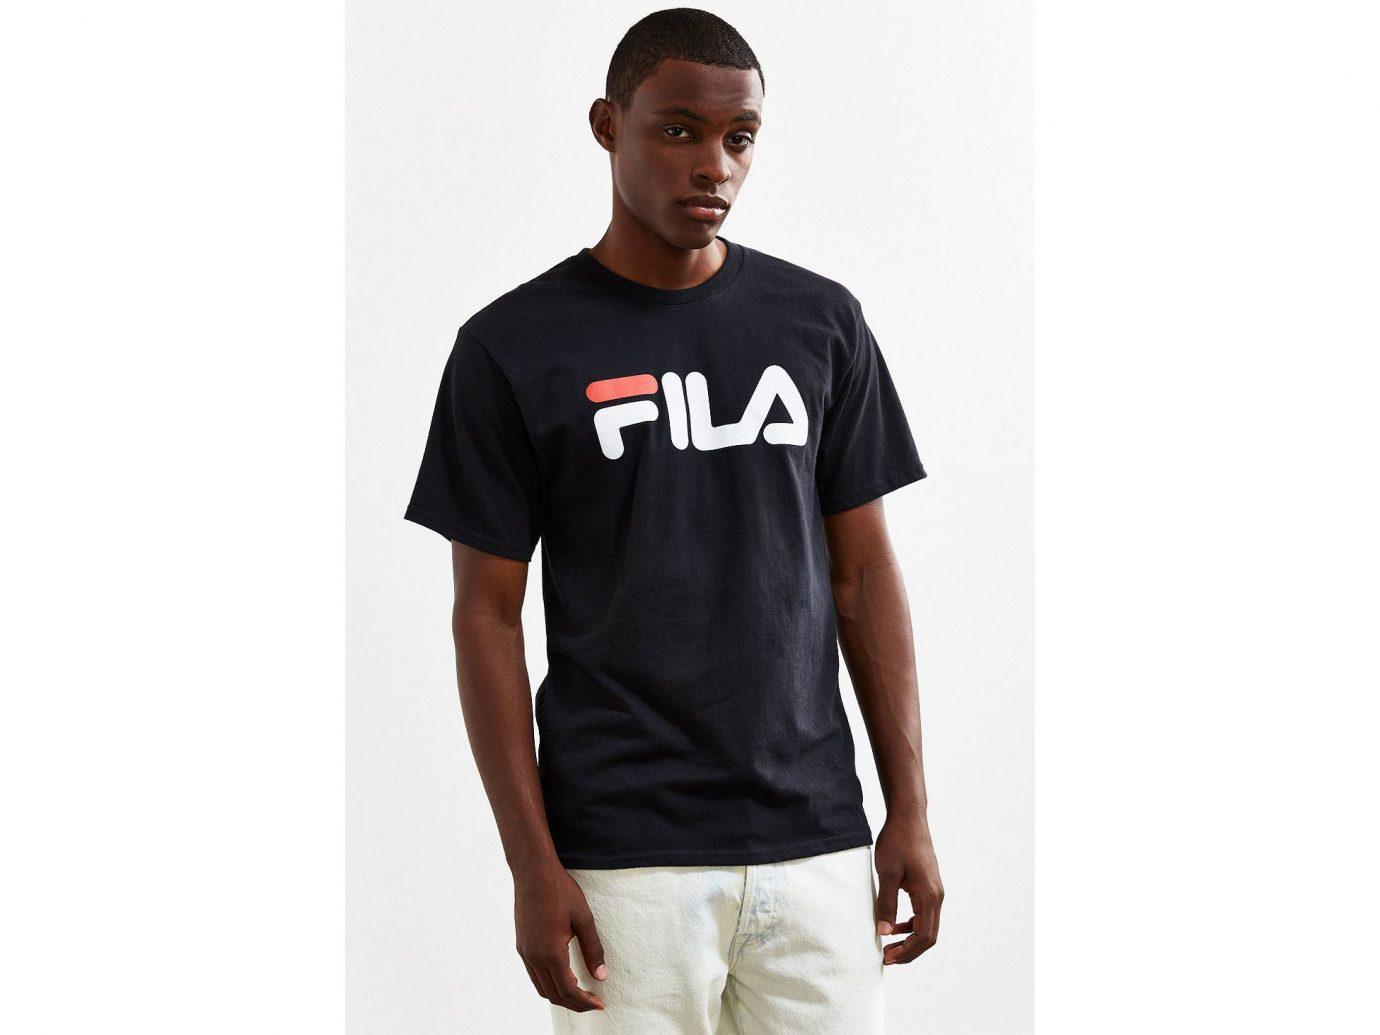 Spring Travel Style + Design Summer Travel Travel Shop t shirt person man sleeve standing shoulder jersey neck pocket product font brand sportswear male